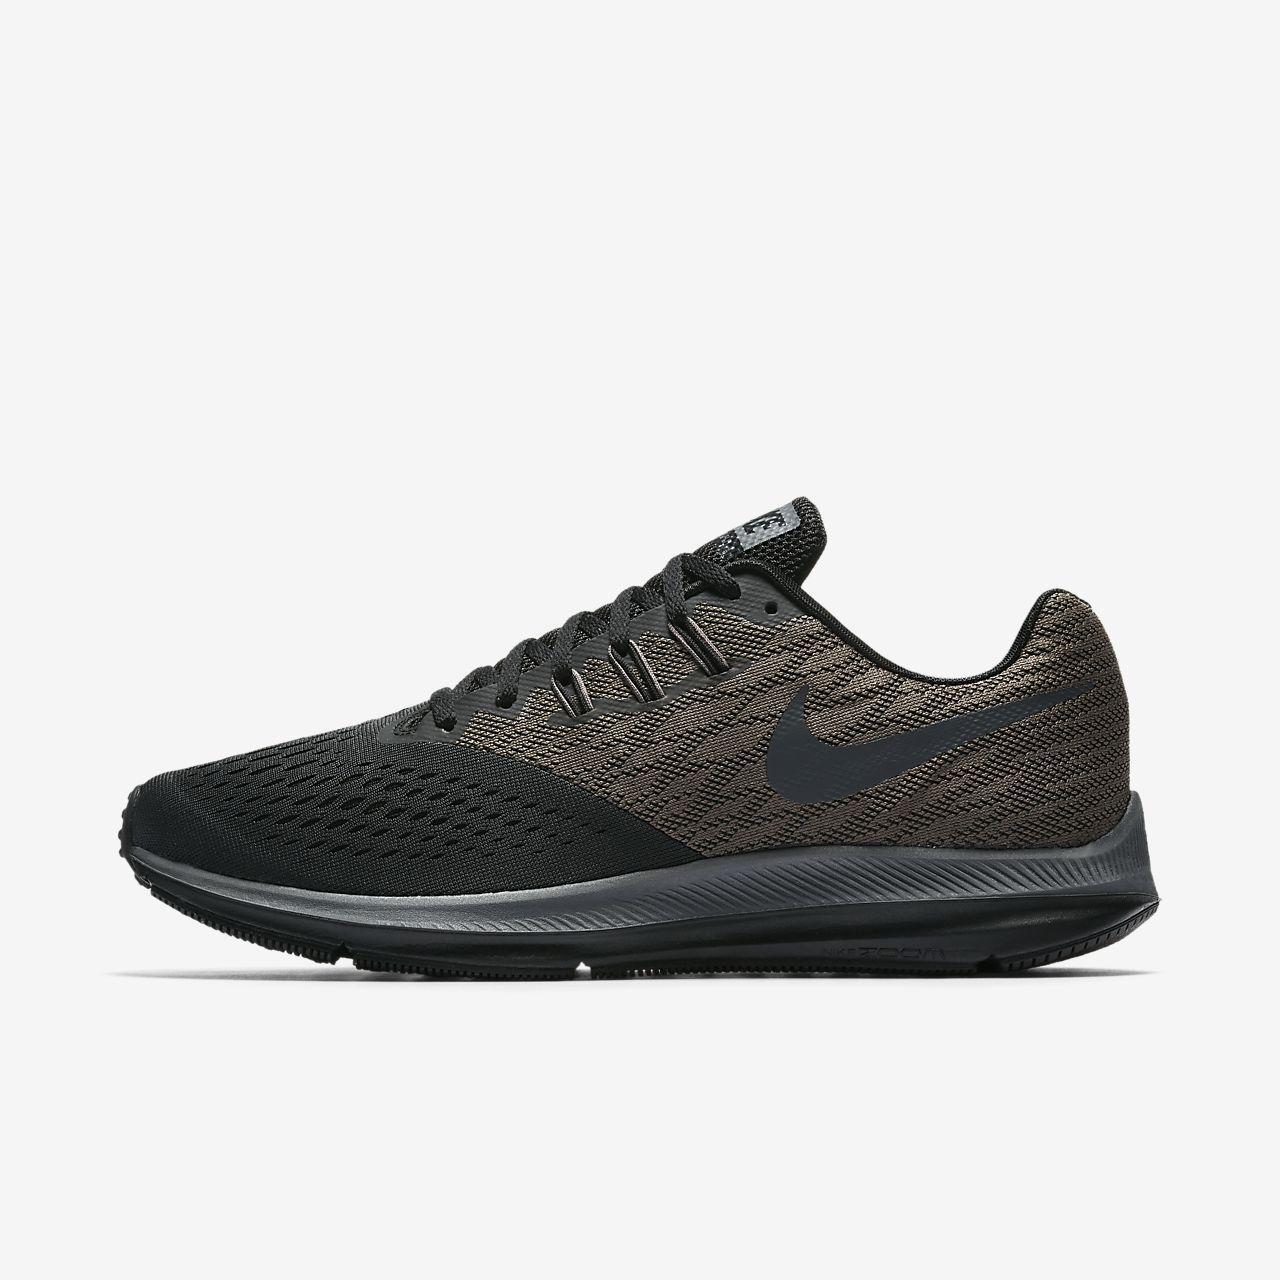 923f06994f2 Nike Zoom Winflo 4 Men s Running Shoe. Nike.com RO